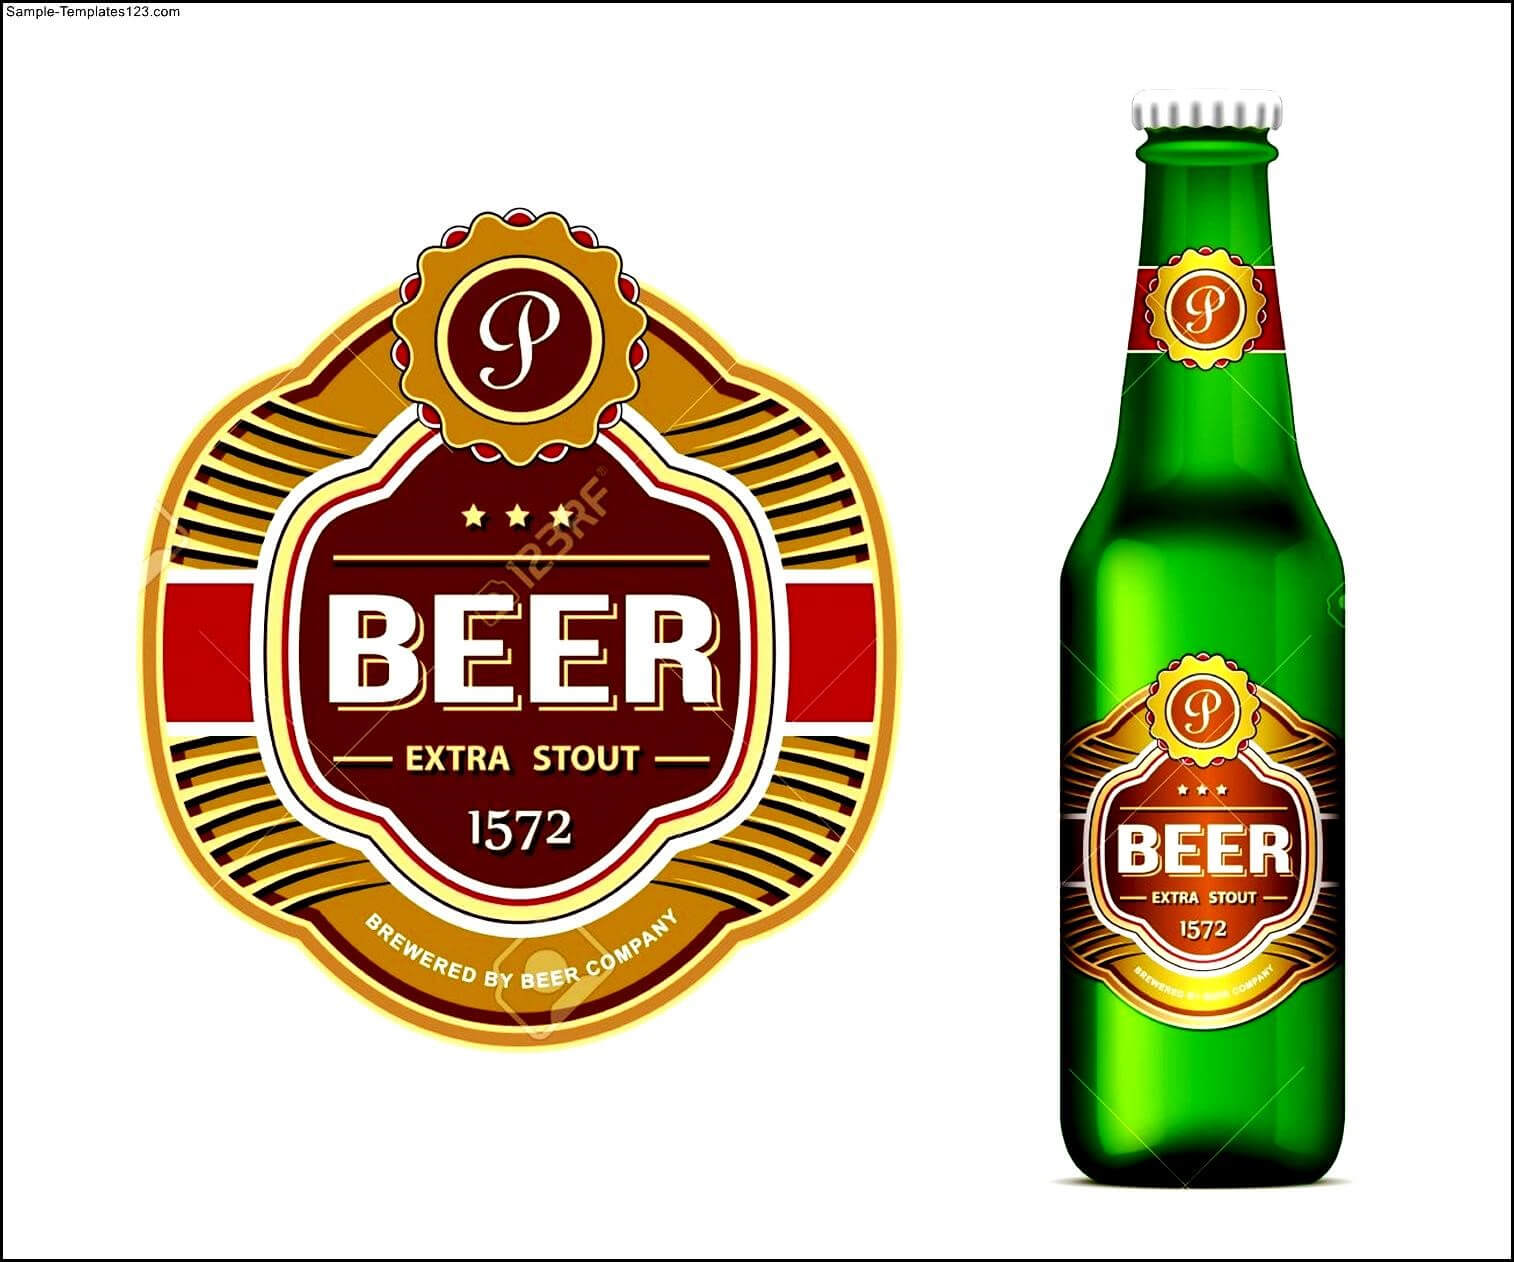 Beer Bottle Label Template Word - Sample Templates - Sample In Beer Label Template Psd